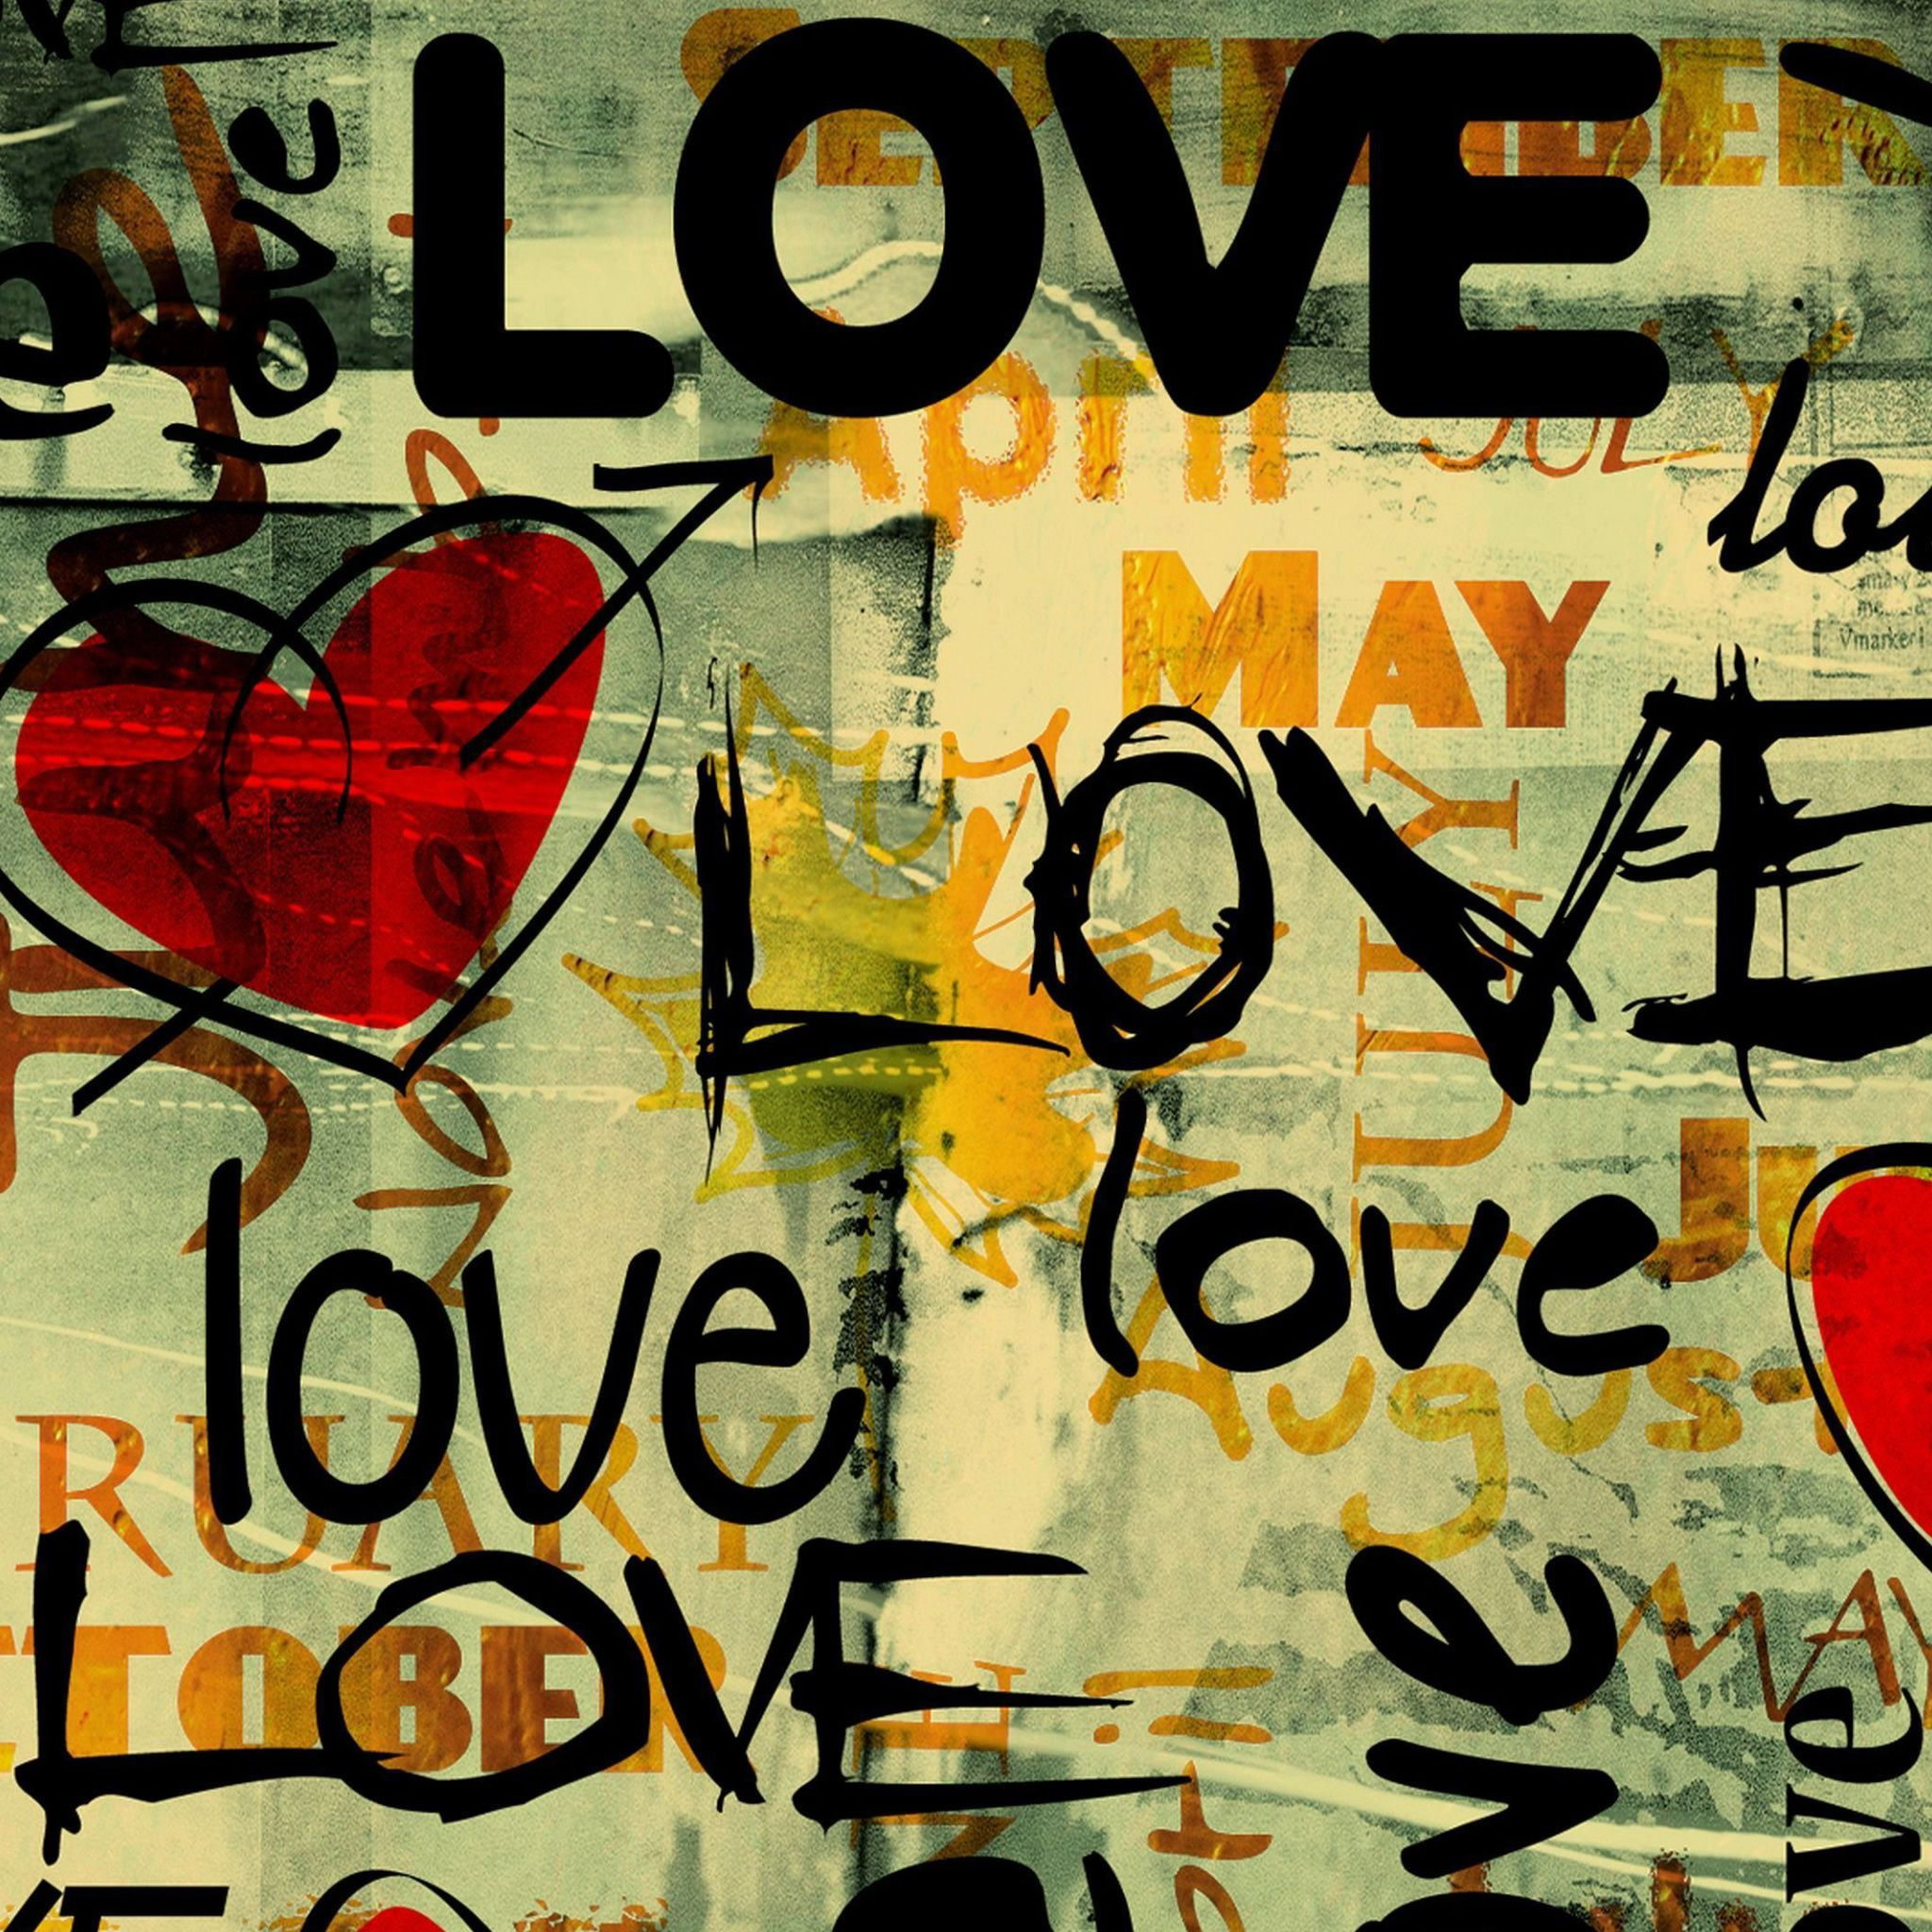 Graffiti art wallpaper iphone - Love Written In Graffiti Ipad Air Wallpaper Download Iphone